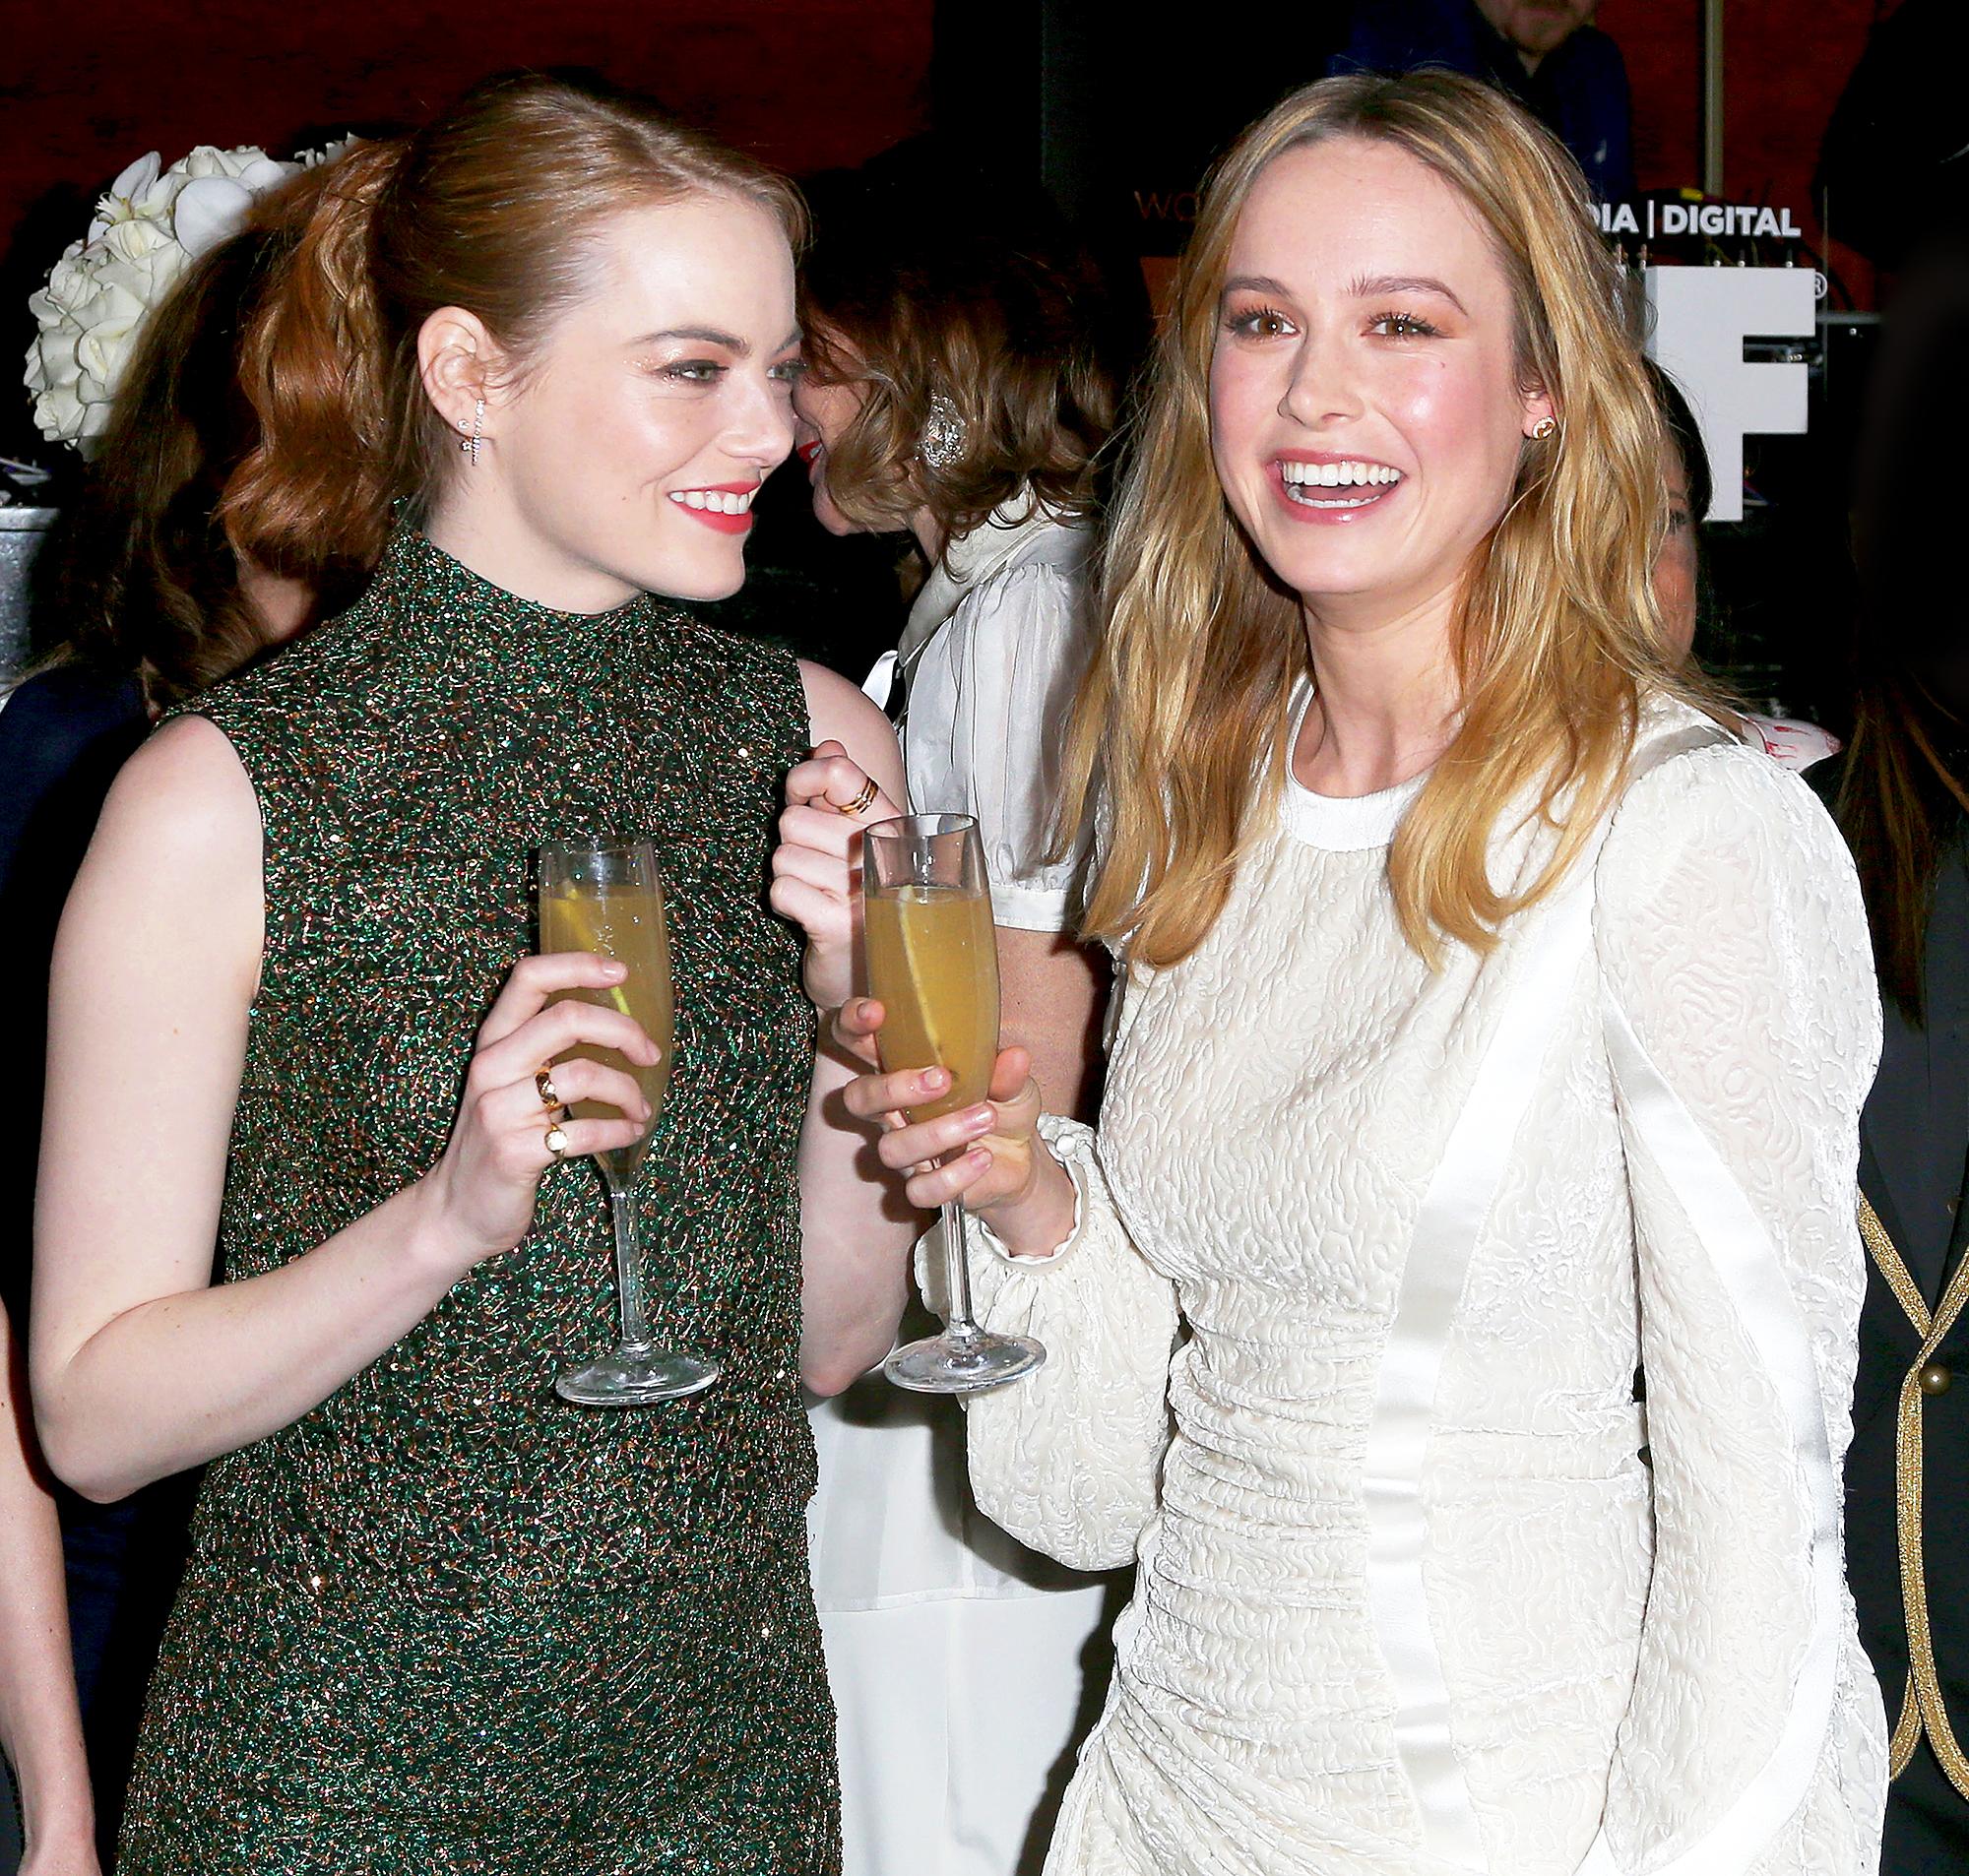 Emma Stone and Brie Larson